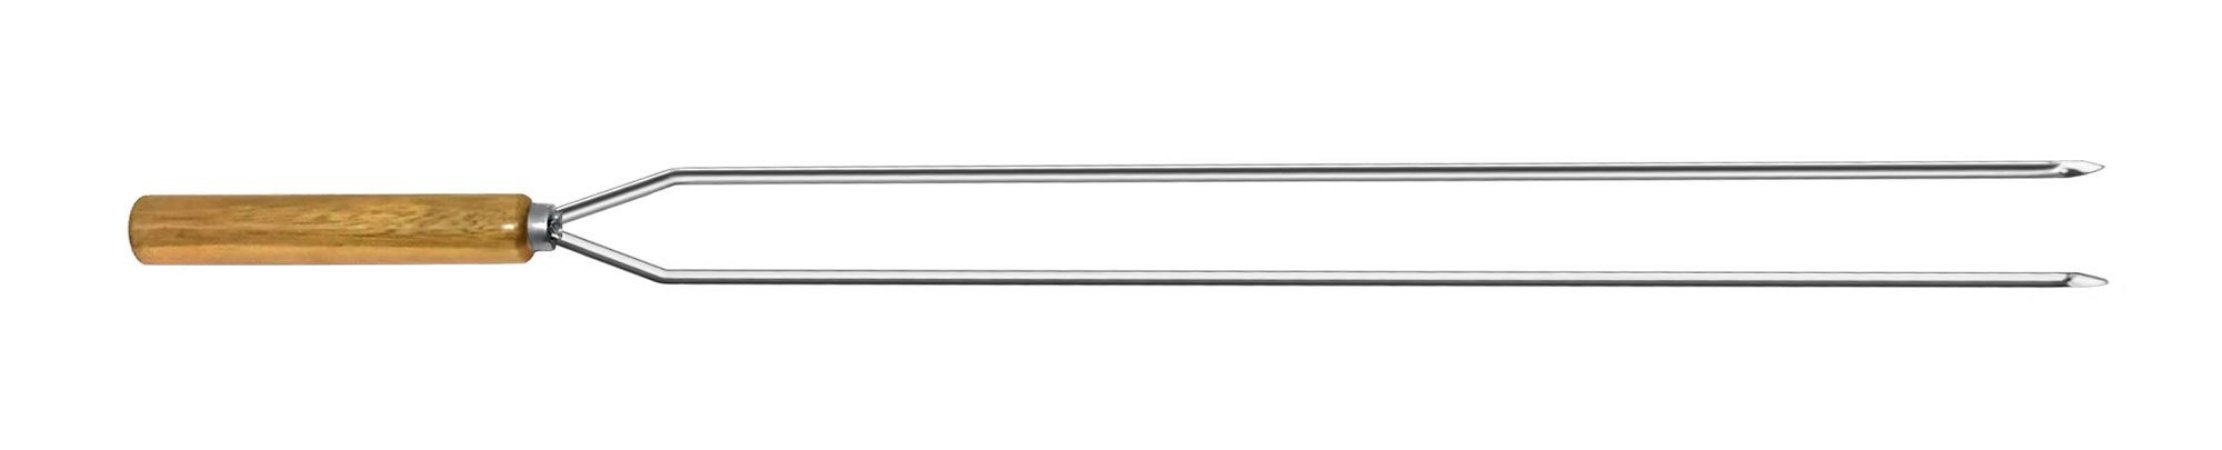 Espeto Inox Cupim Duplo 095 cm x 2 mm